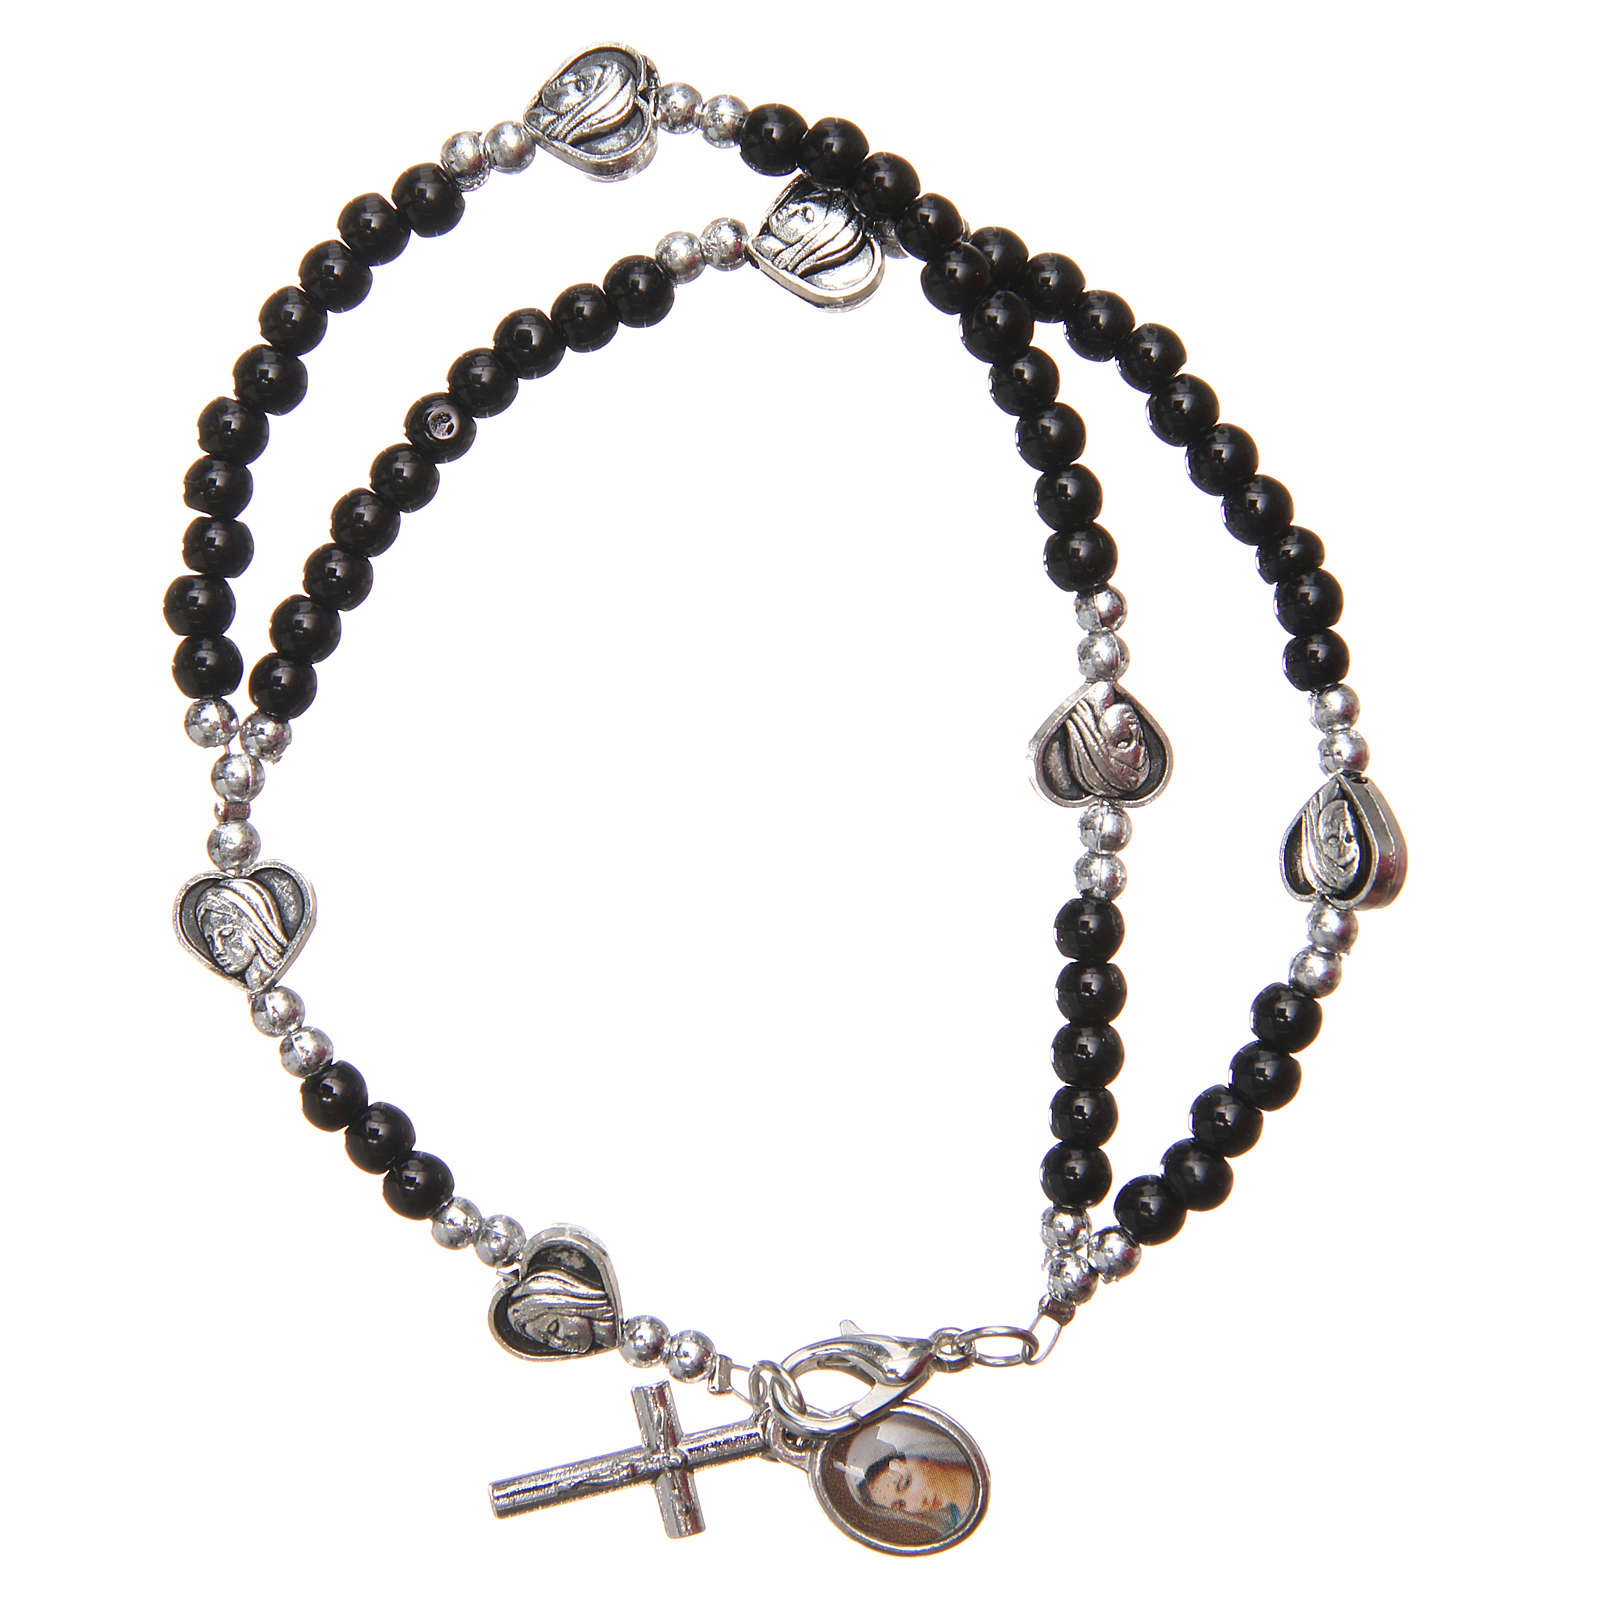 Braccialetto apri chiudi perline nere Madonna Medjugorje 4